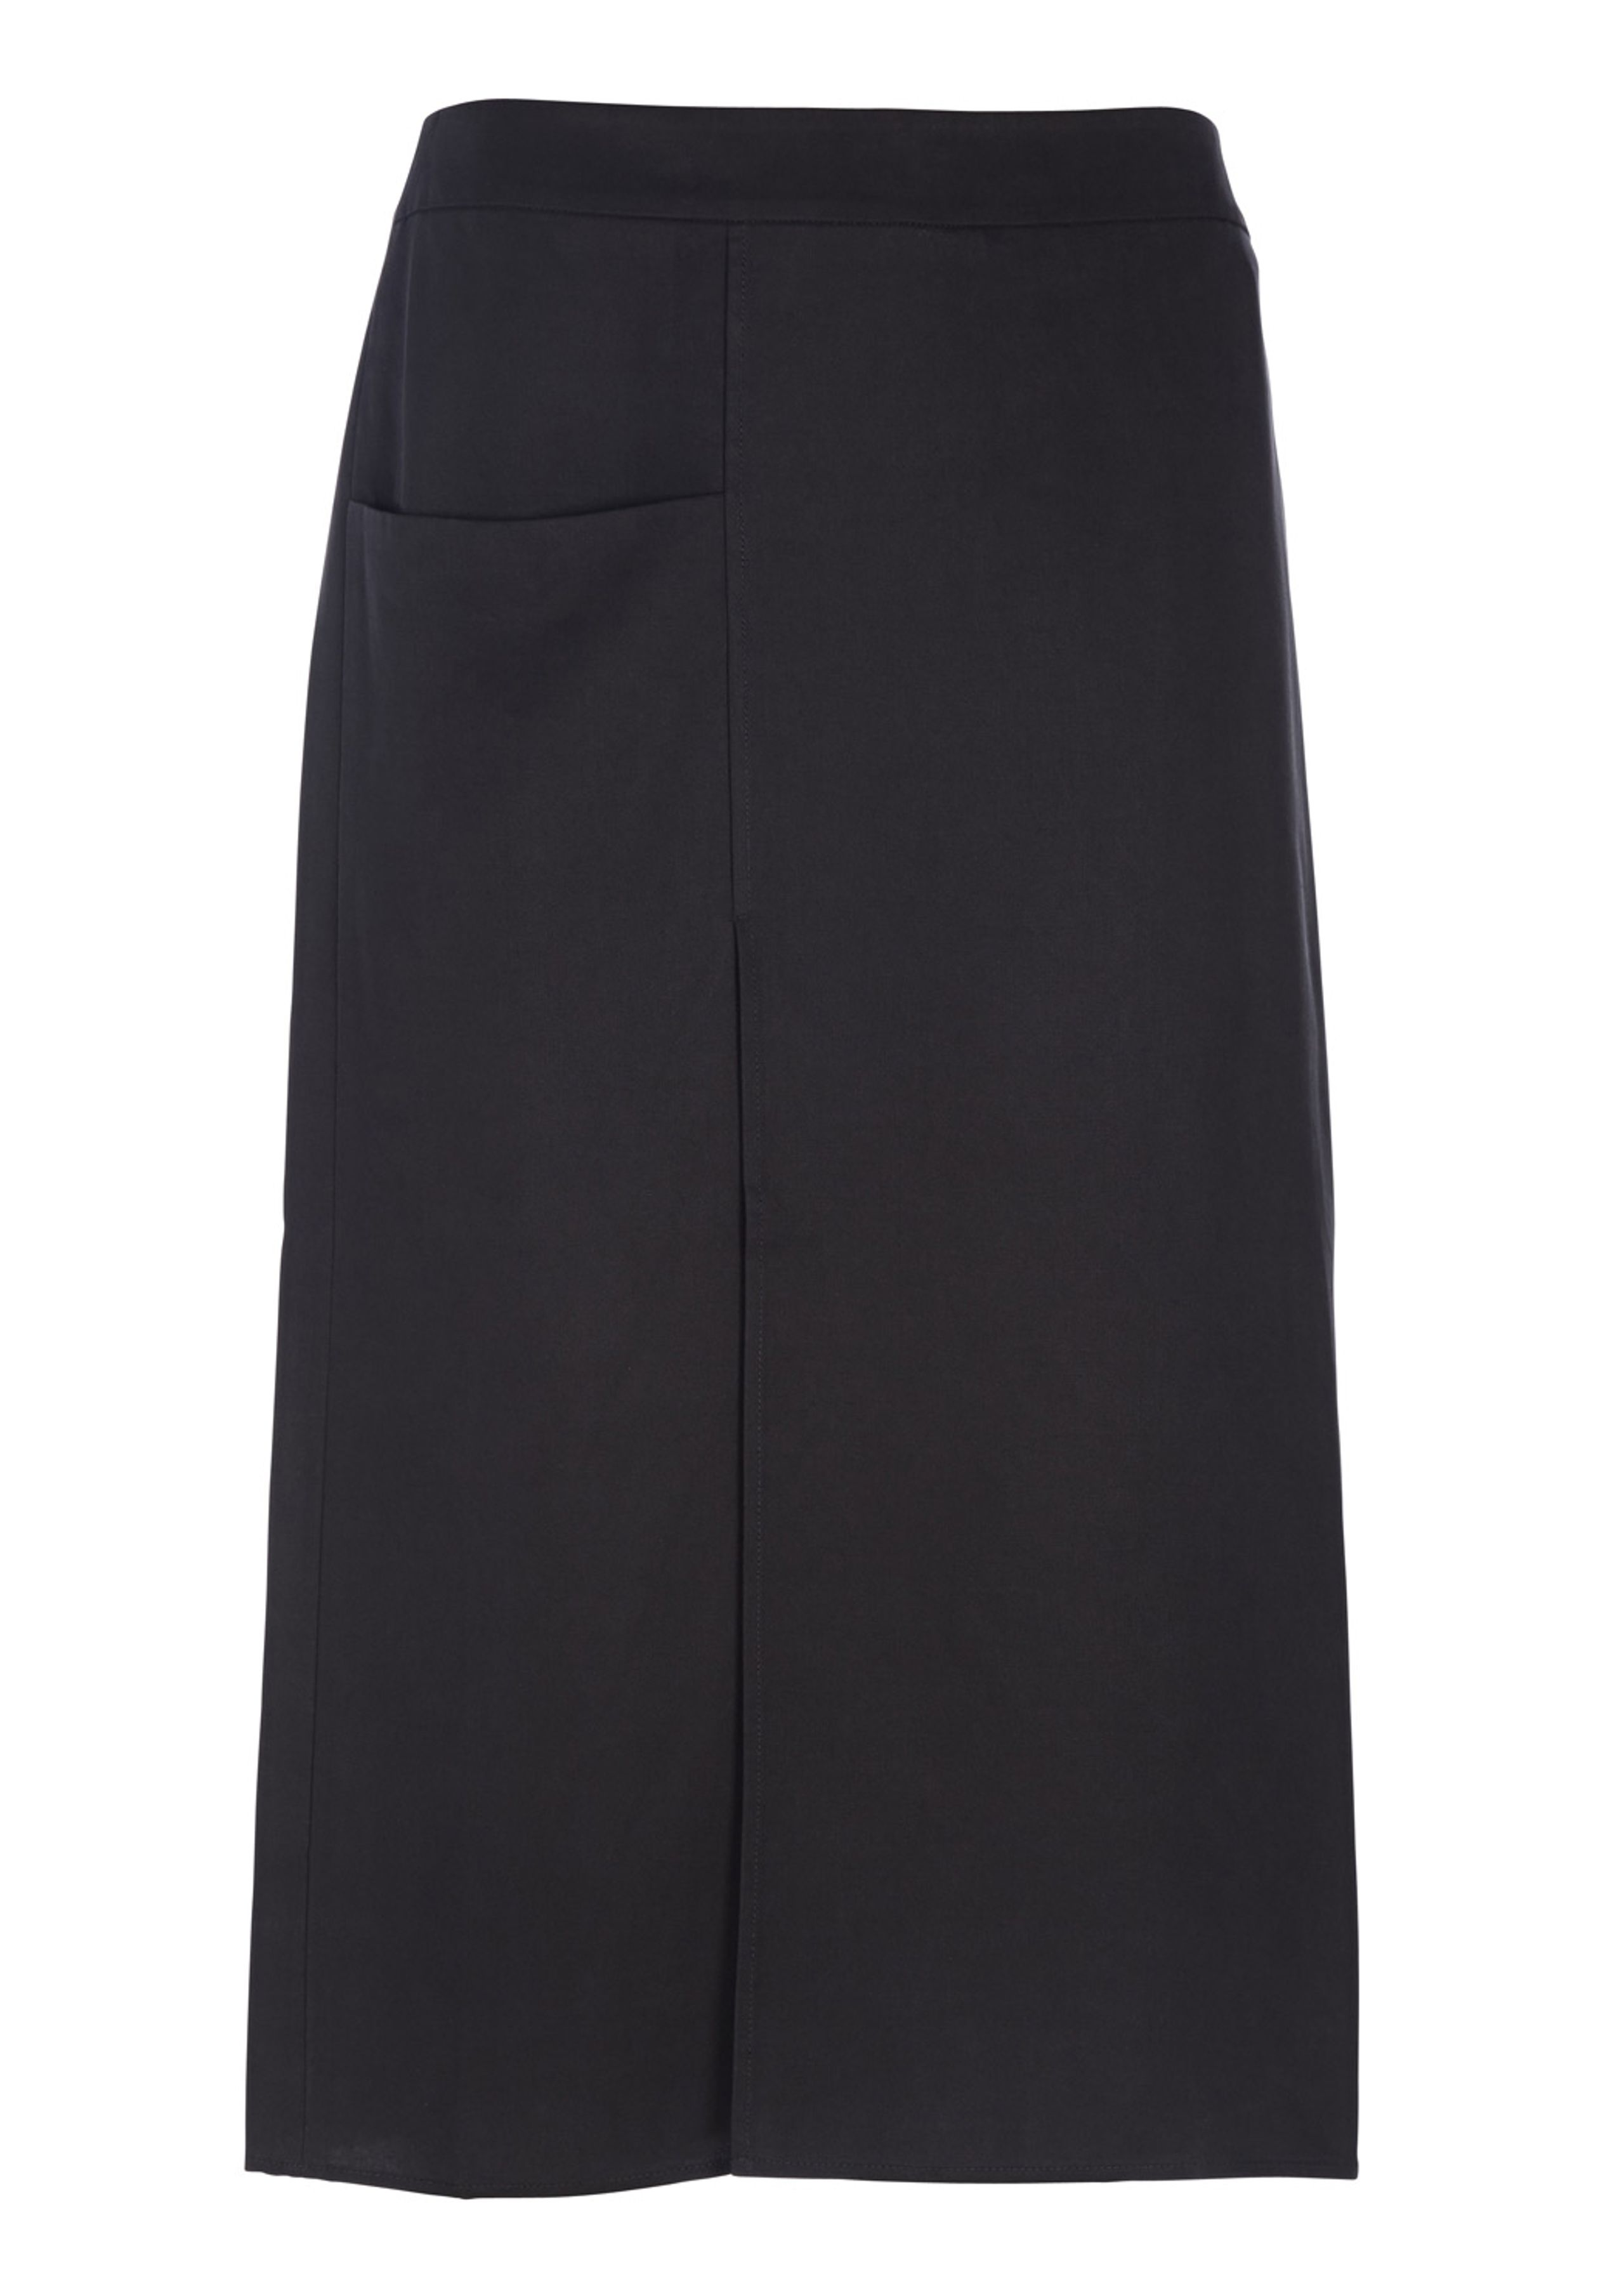 Well skirt